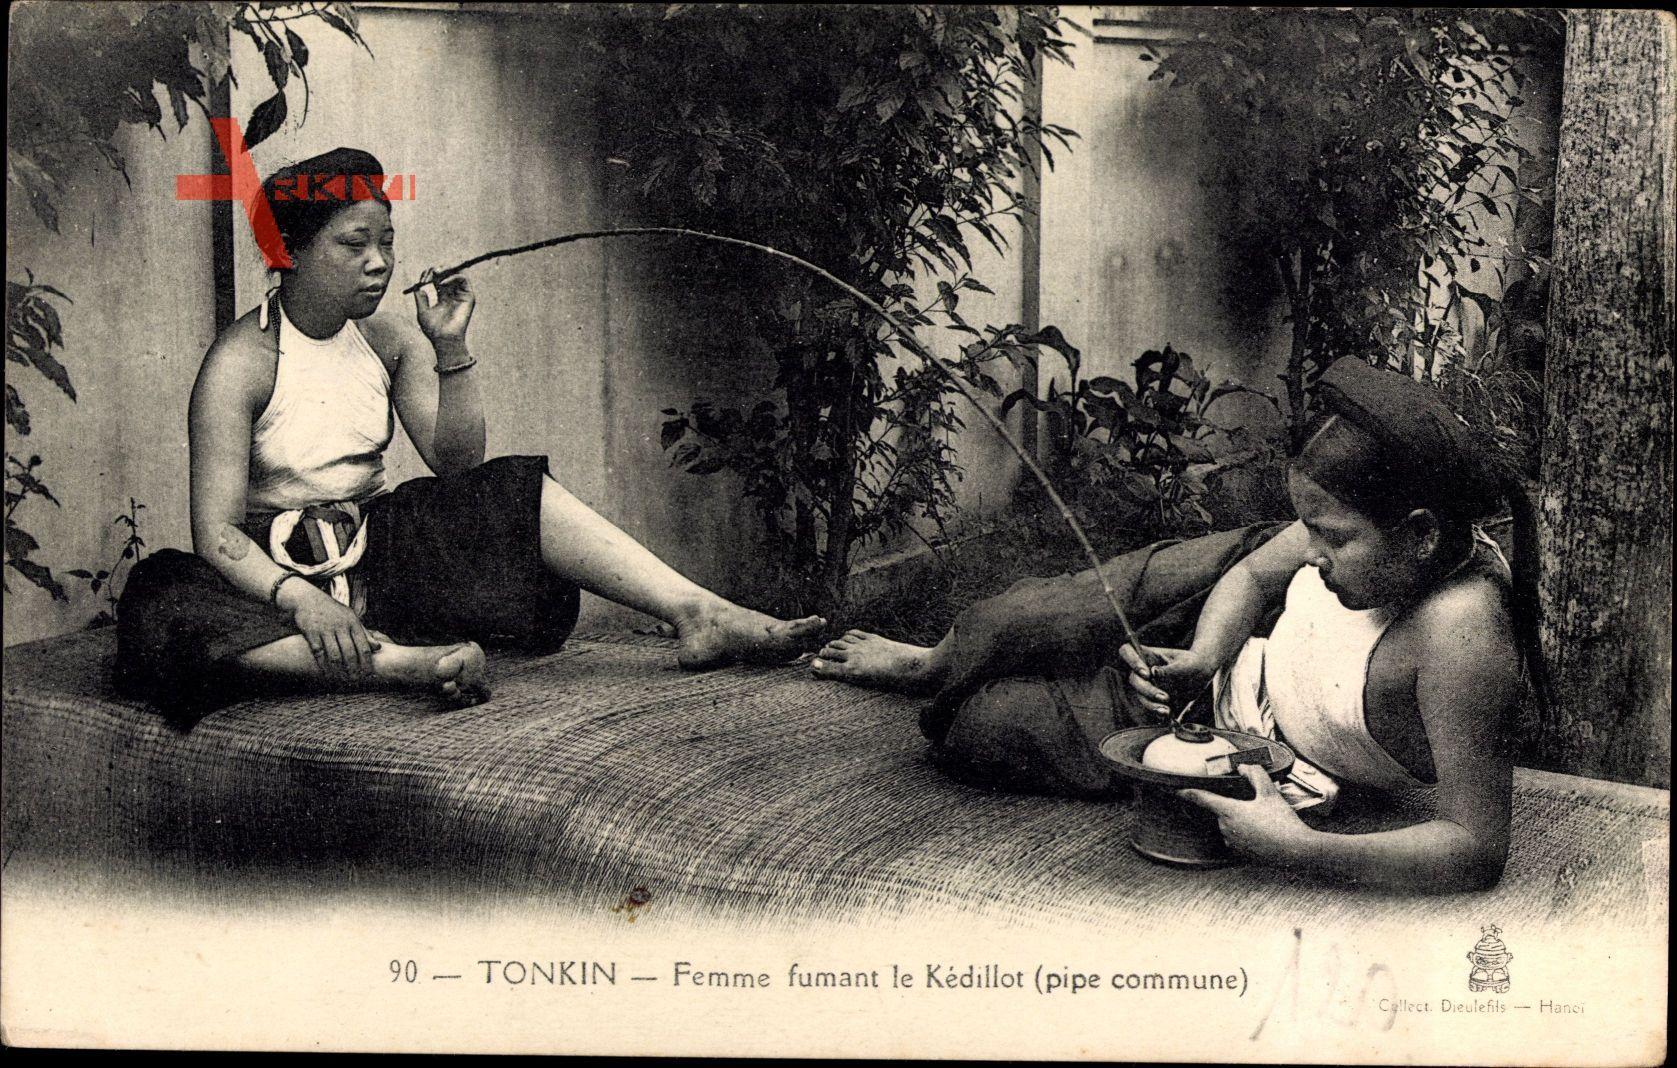 Tonkin Vietnam, Femme fumant le Kédillot, Pipe commune, Vietnamesin, Pfeiffe